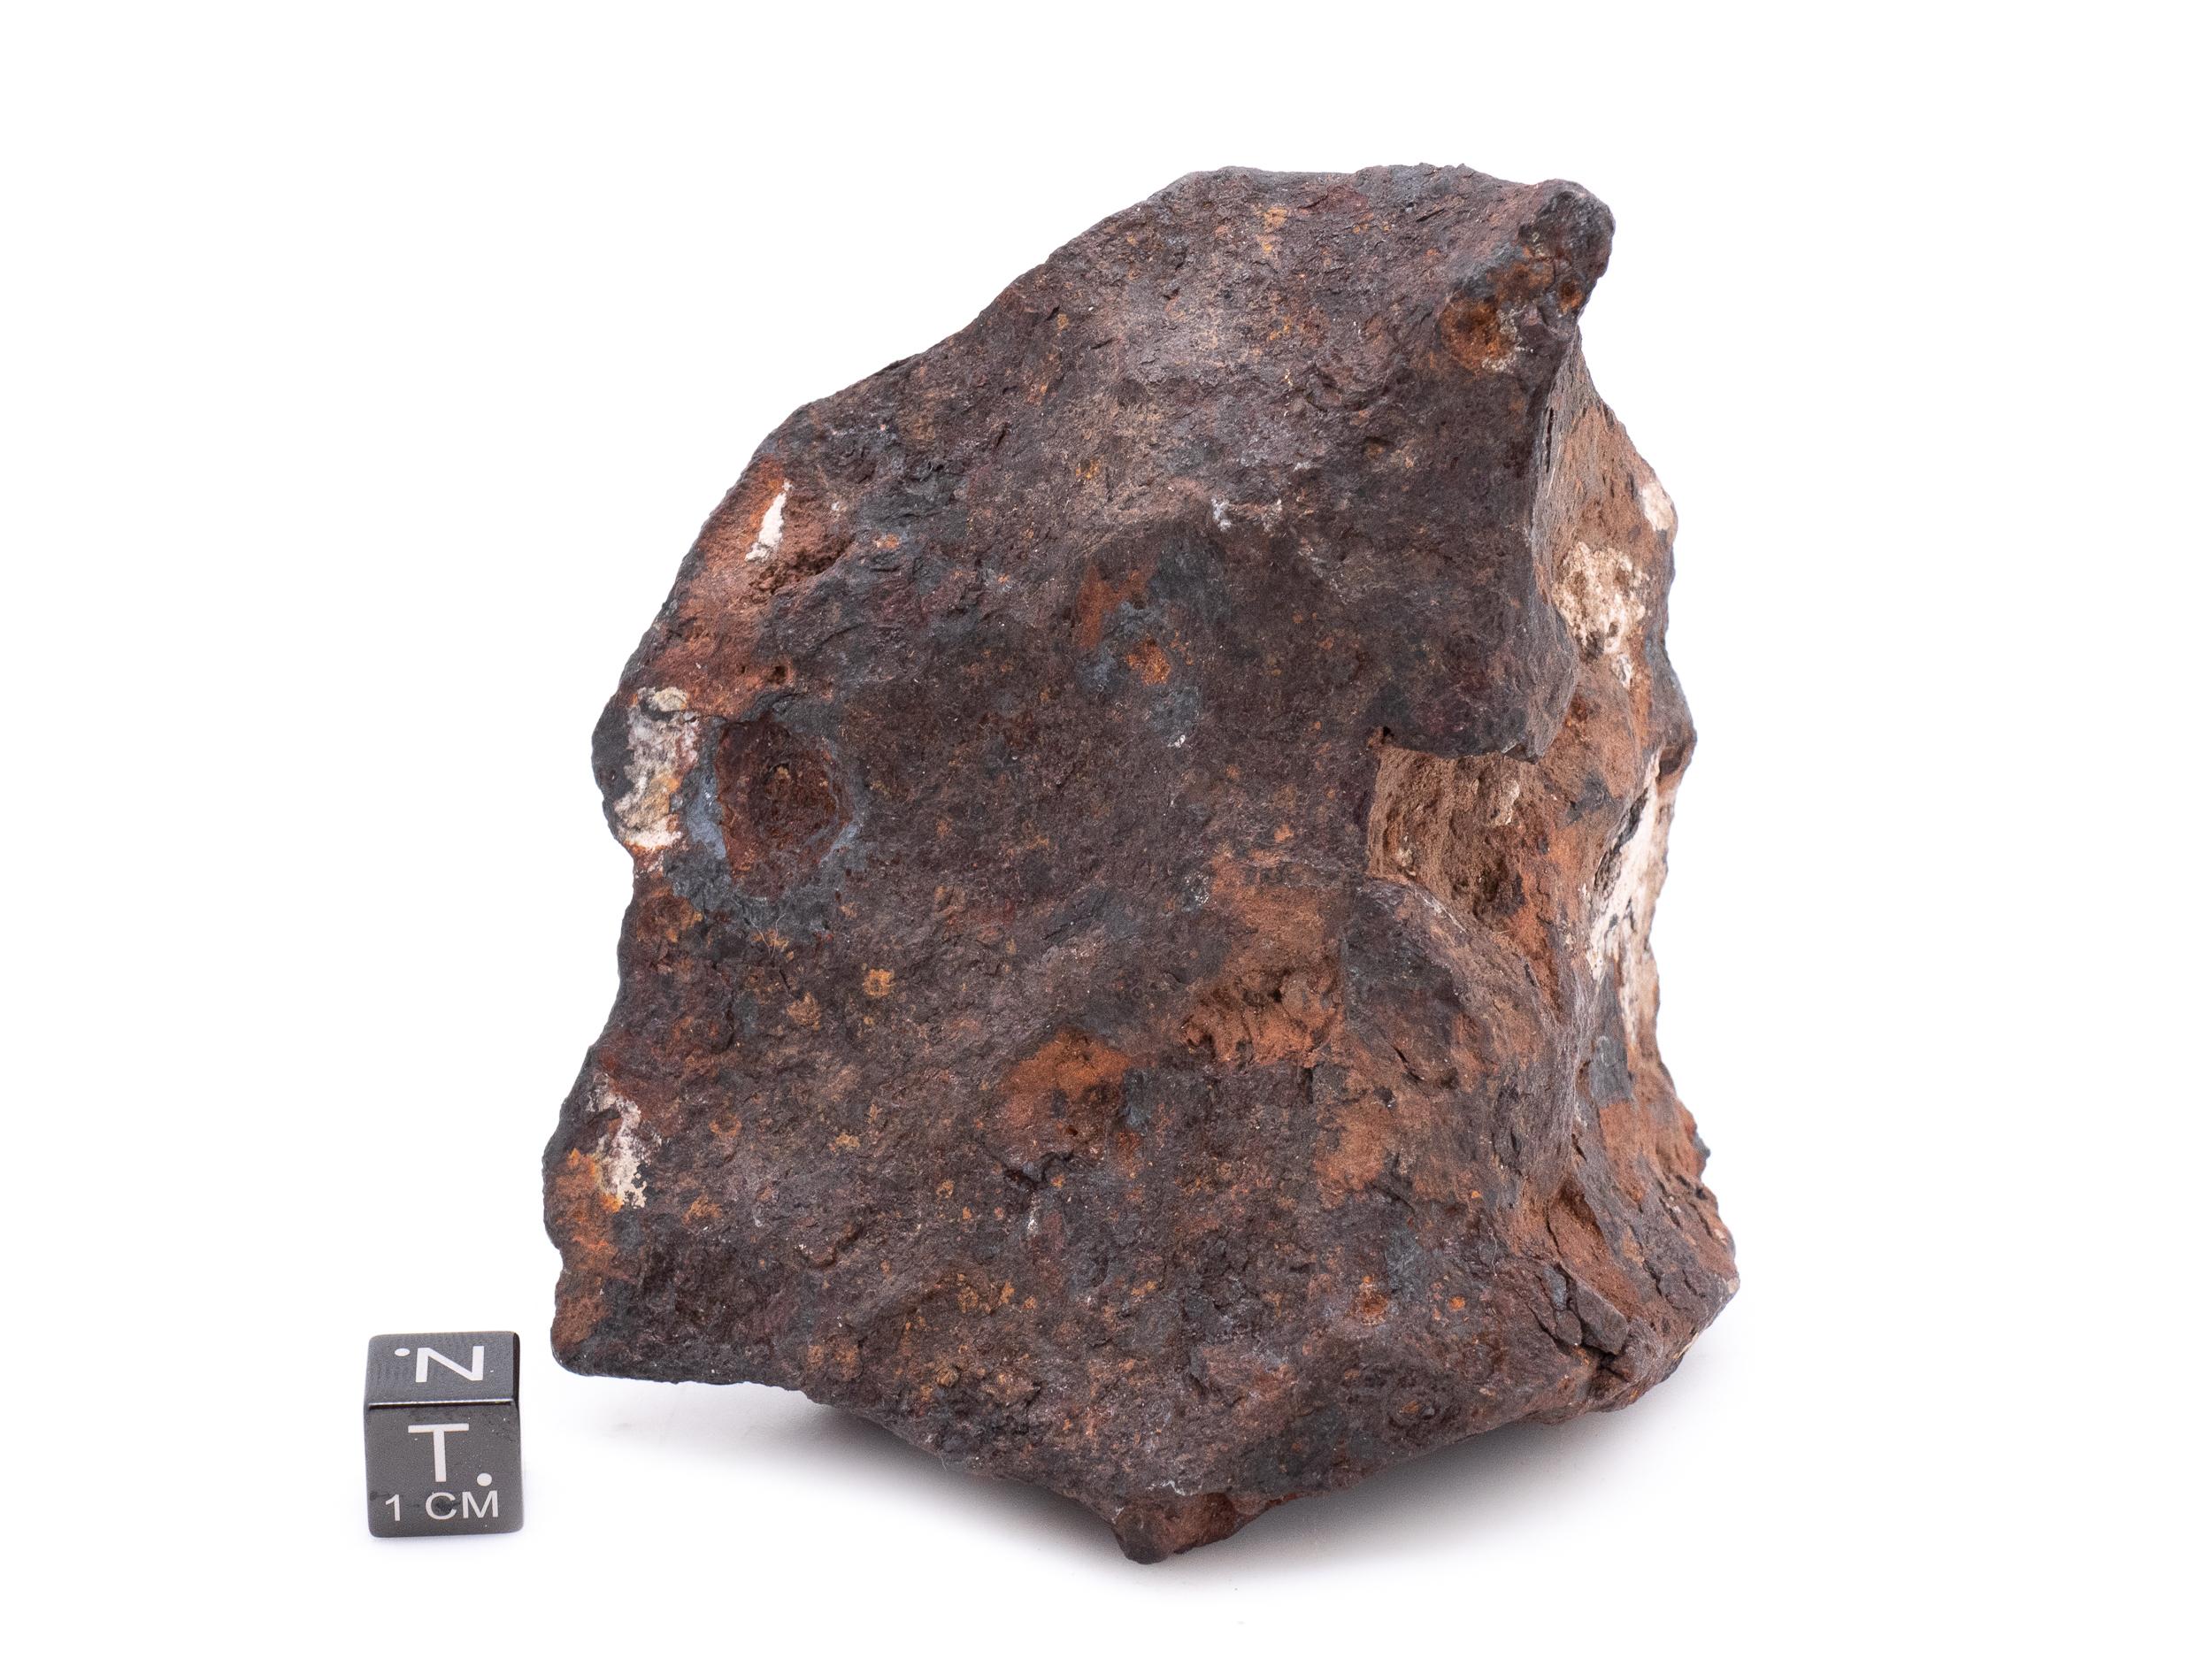 odessa meteorite crater